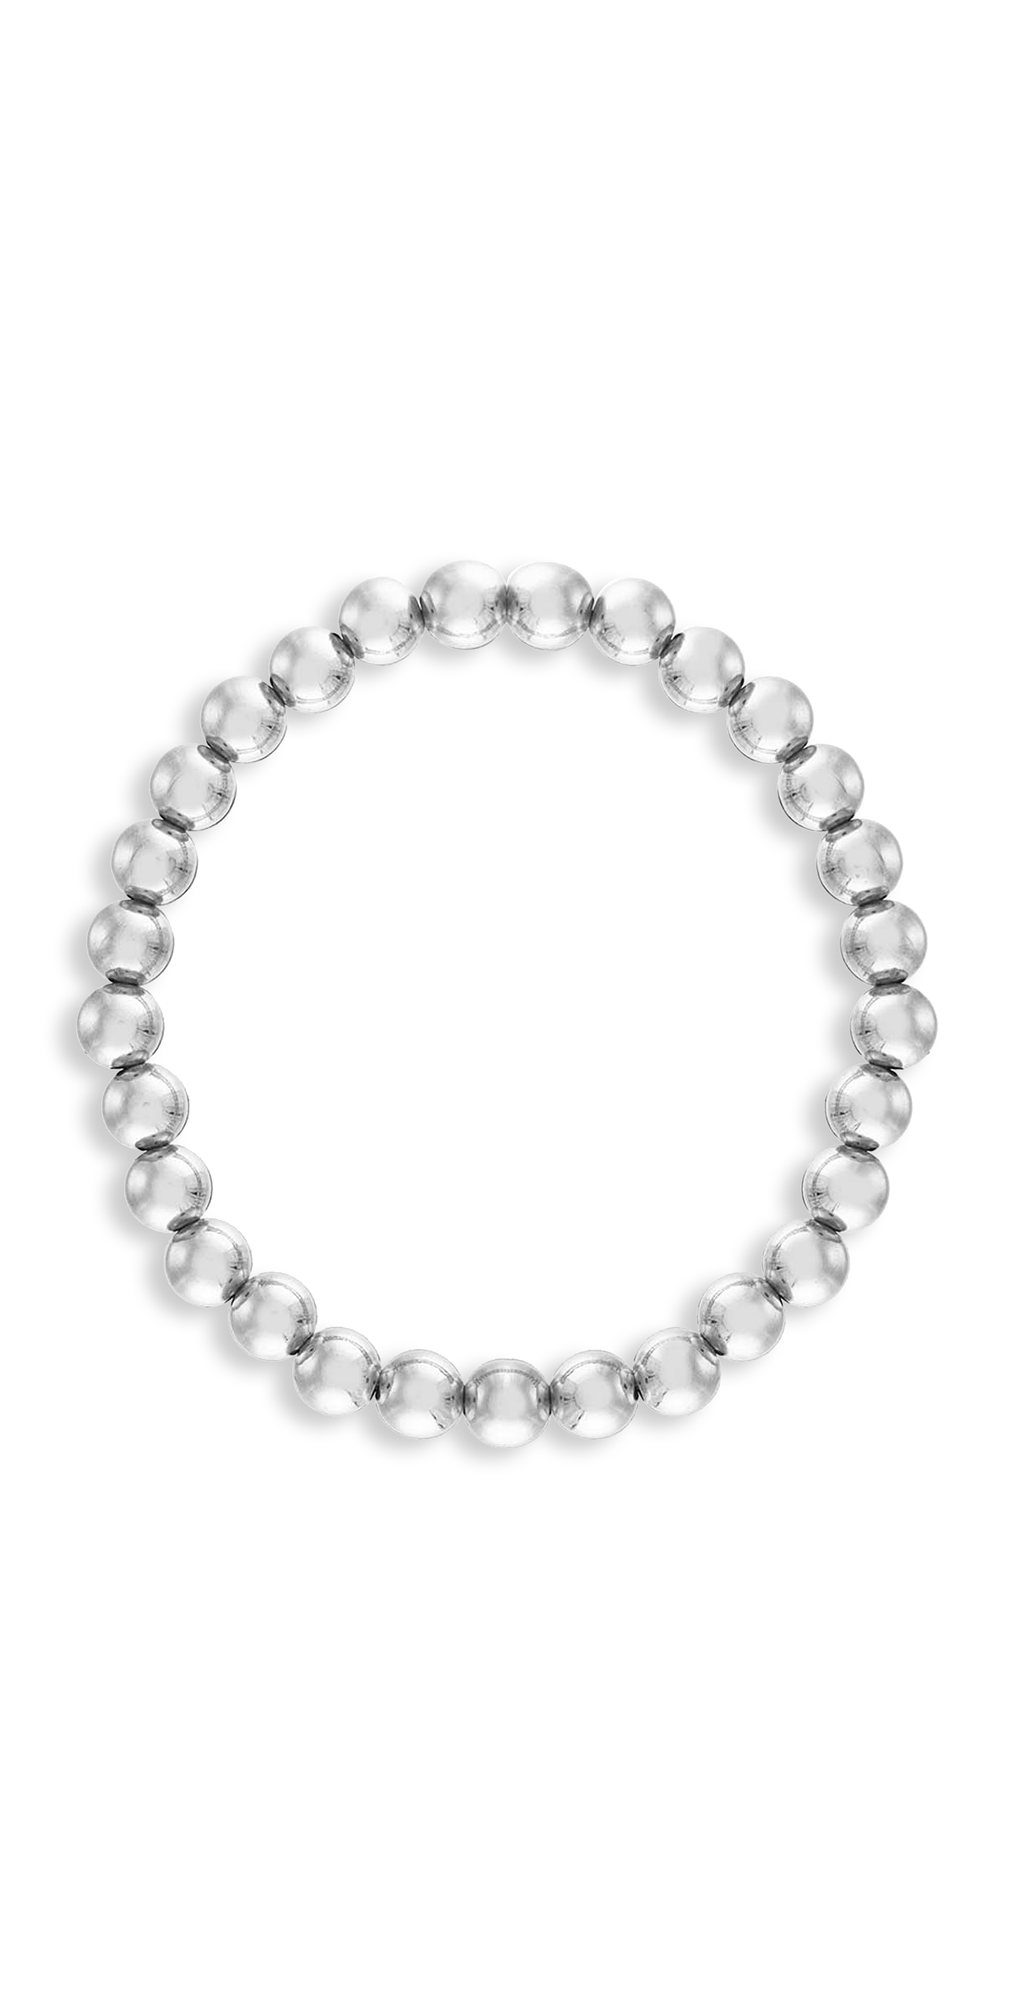 5mm Sterling Silver Bracelet